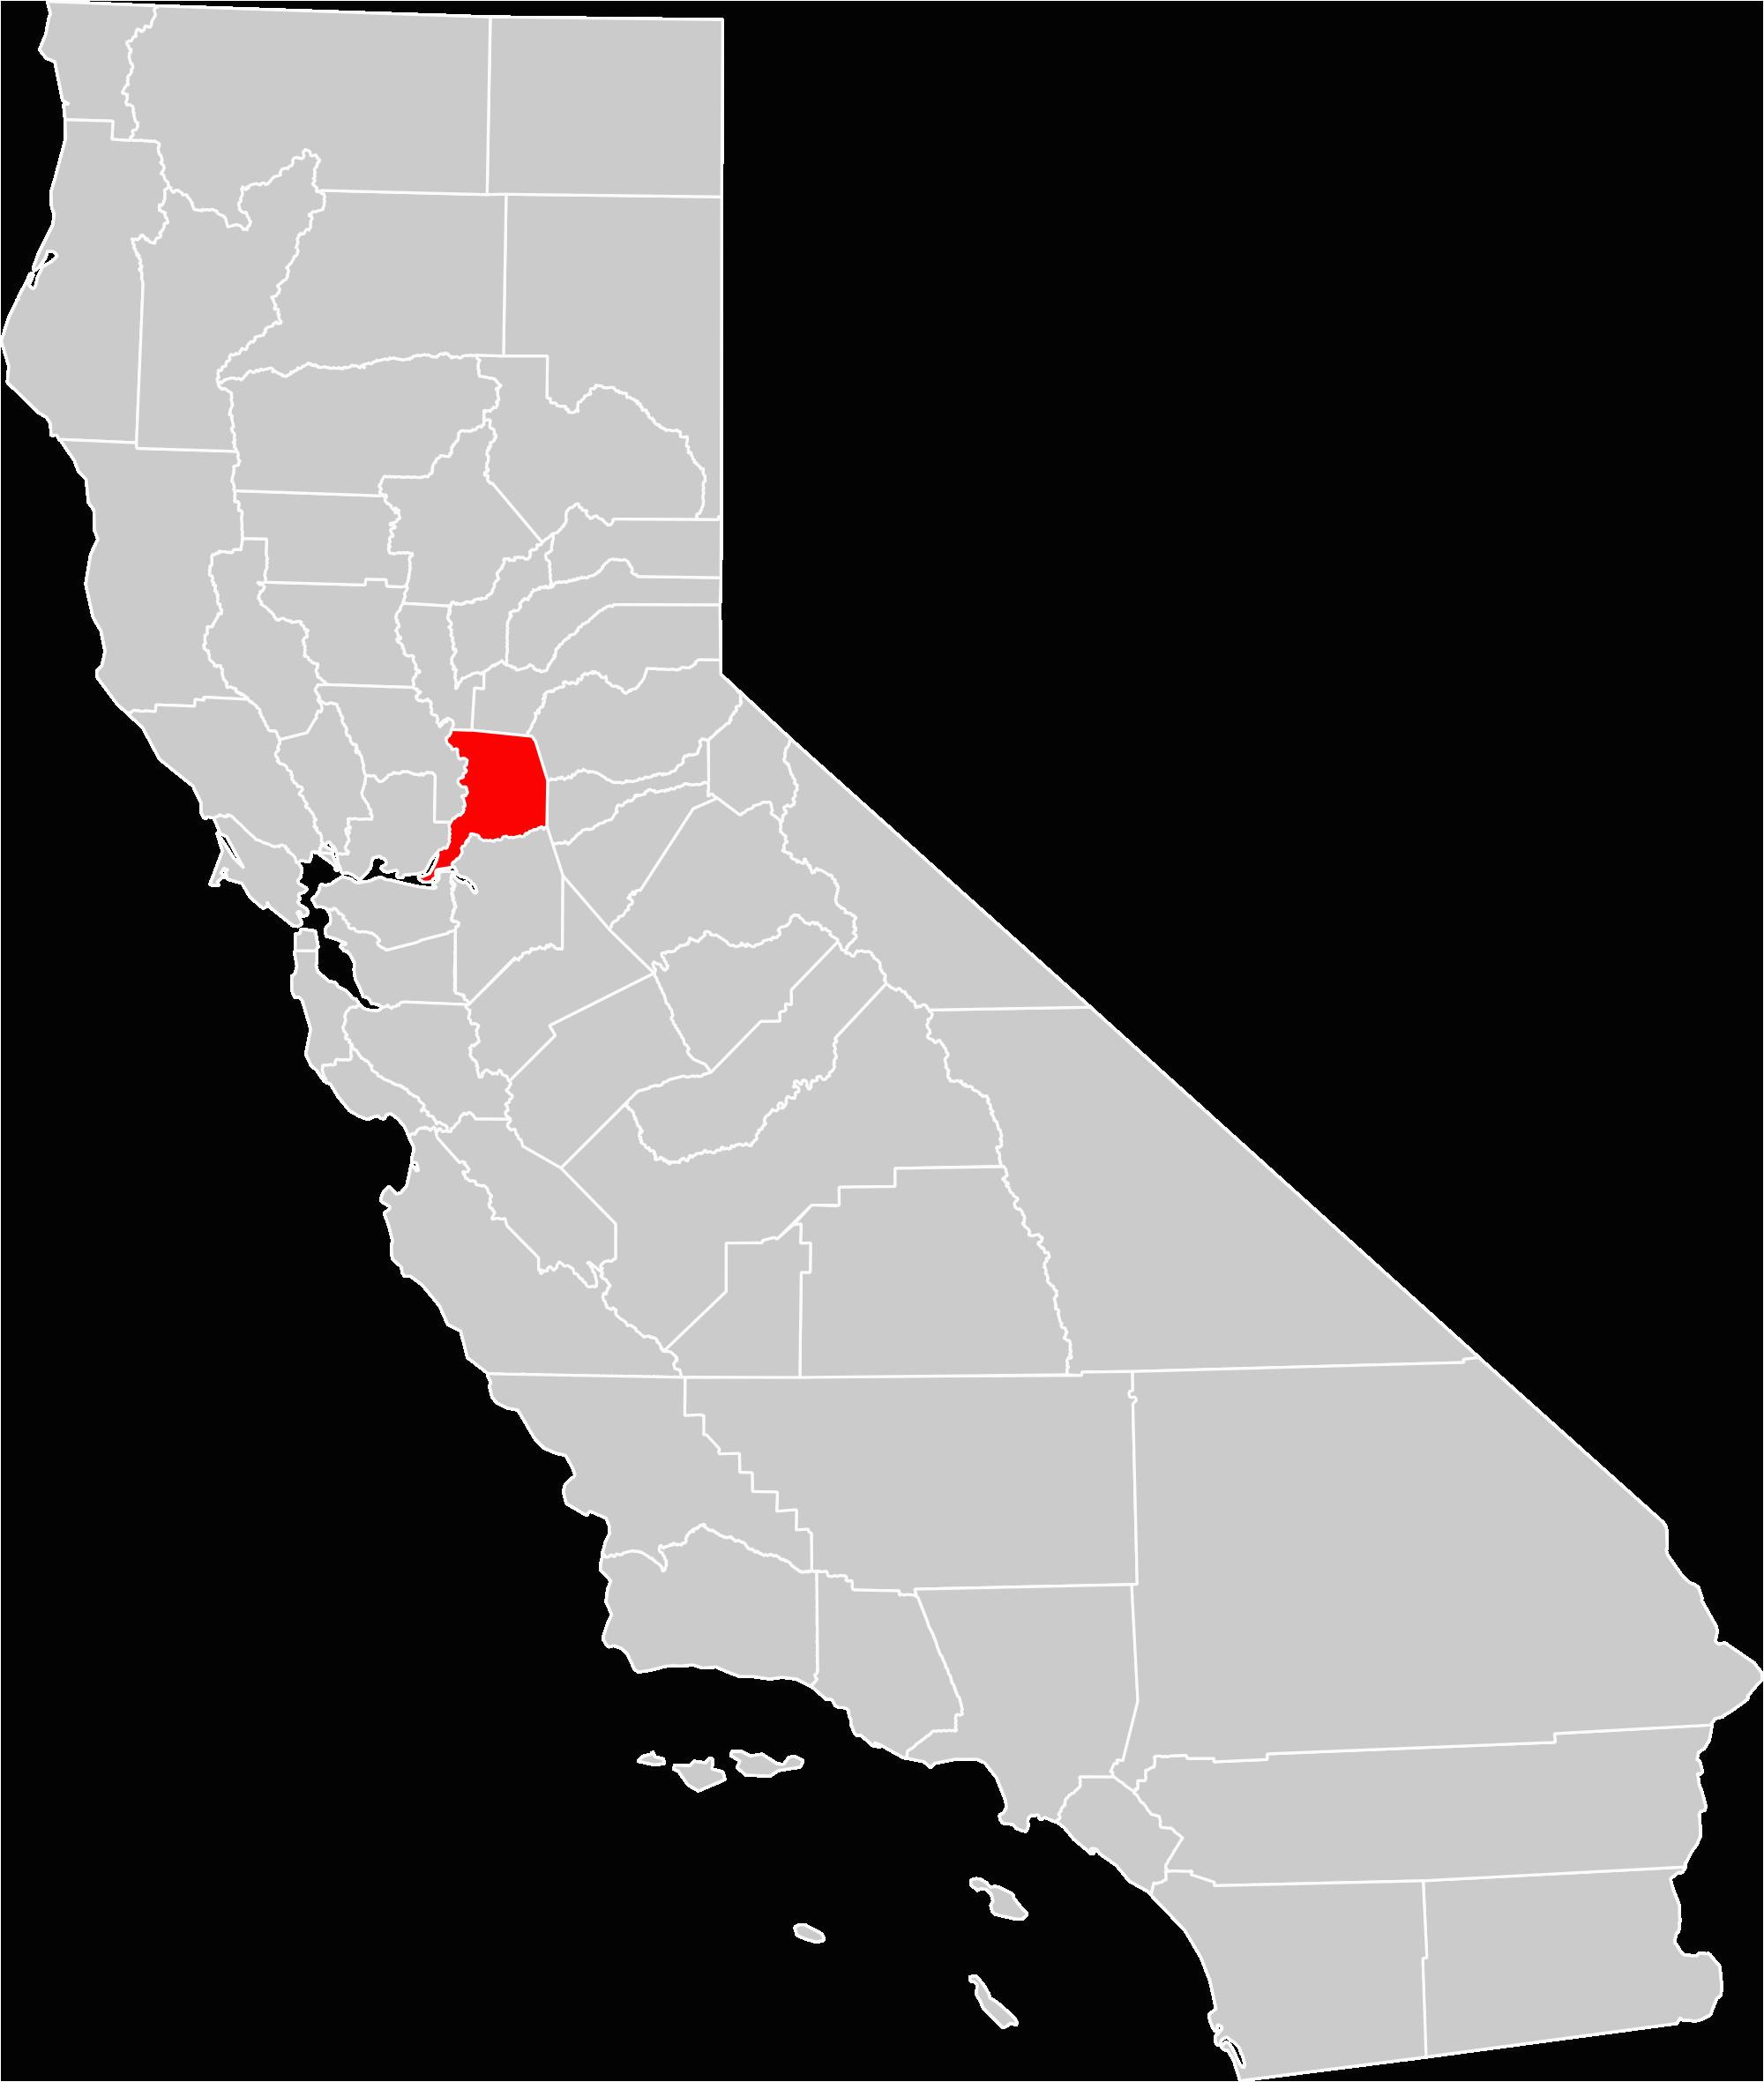 file california county map sacramento county highlighted g high